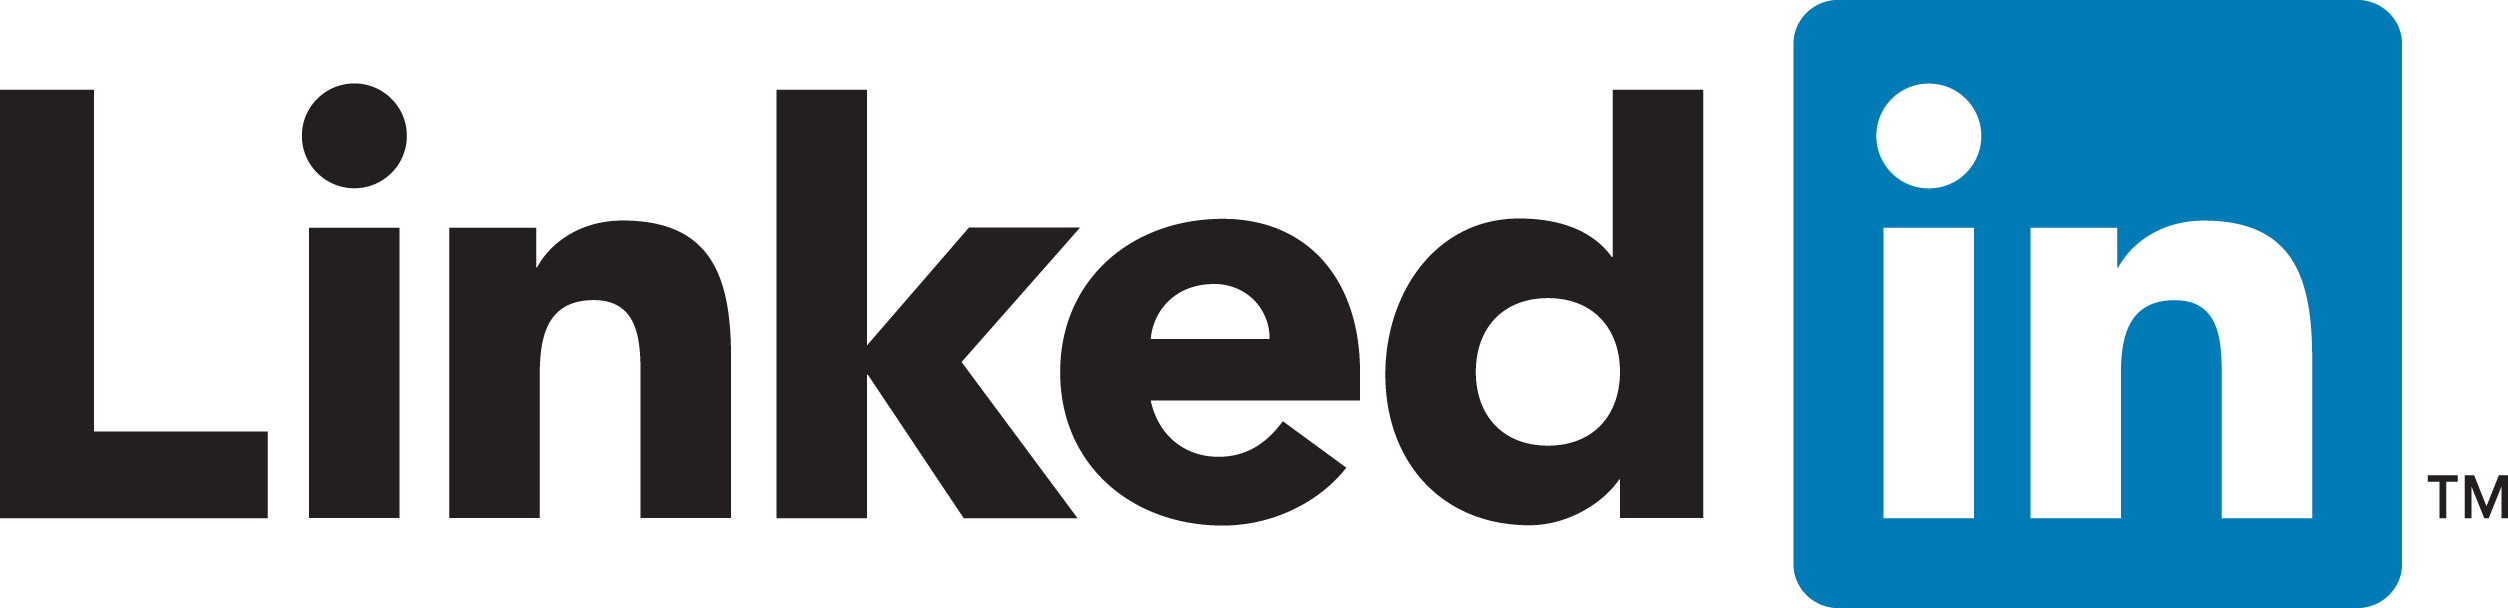 LinkedIn-Logo-2C The Most Popular 15 Social Websites in The World